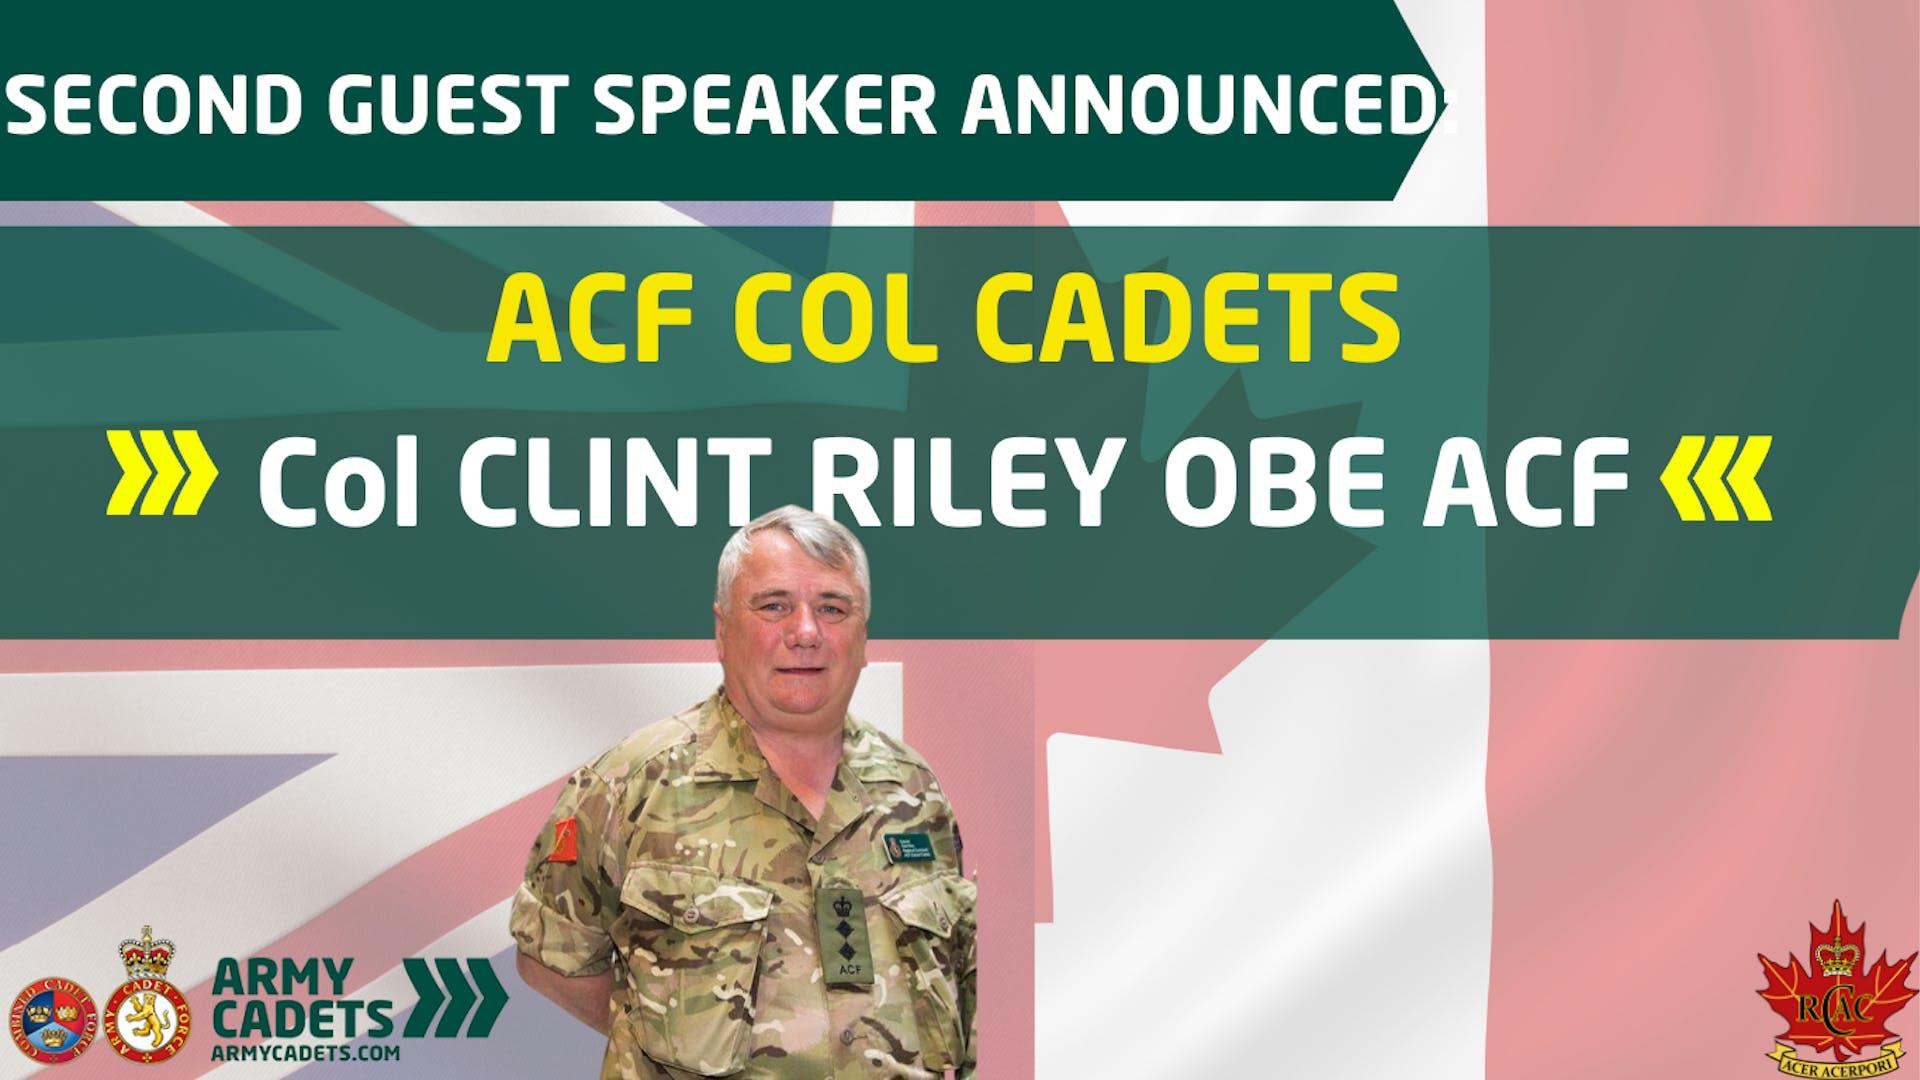 Col Cadets C Riley 2